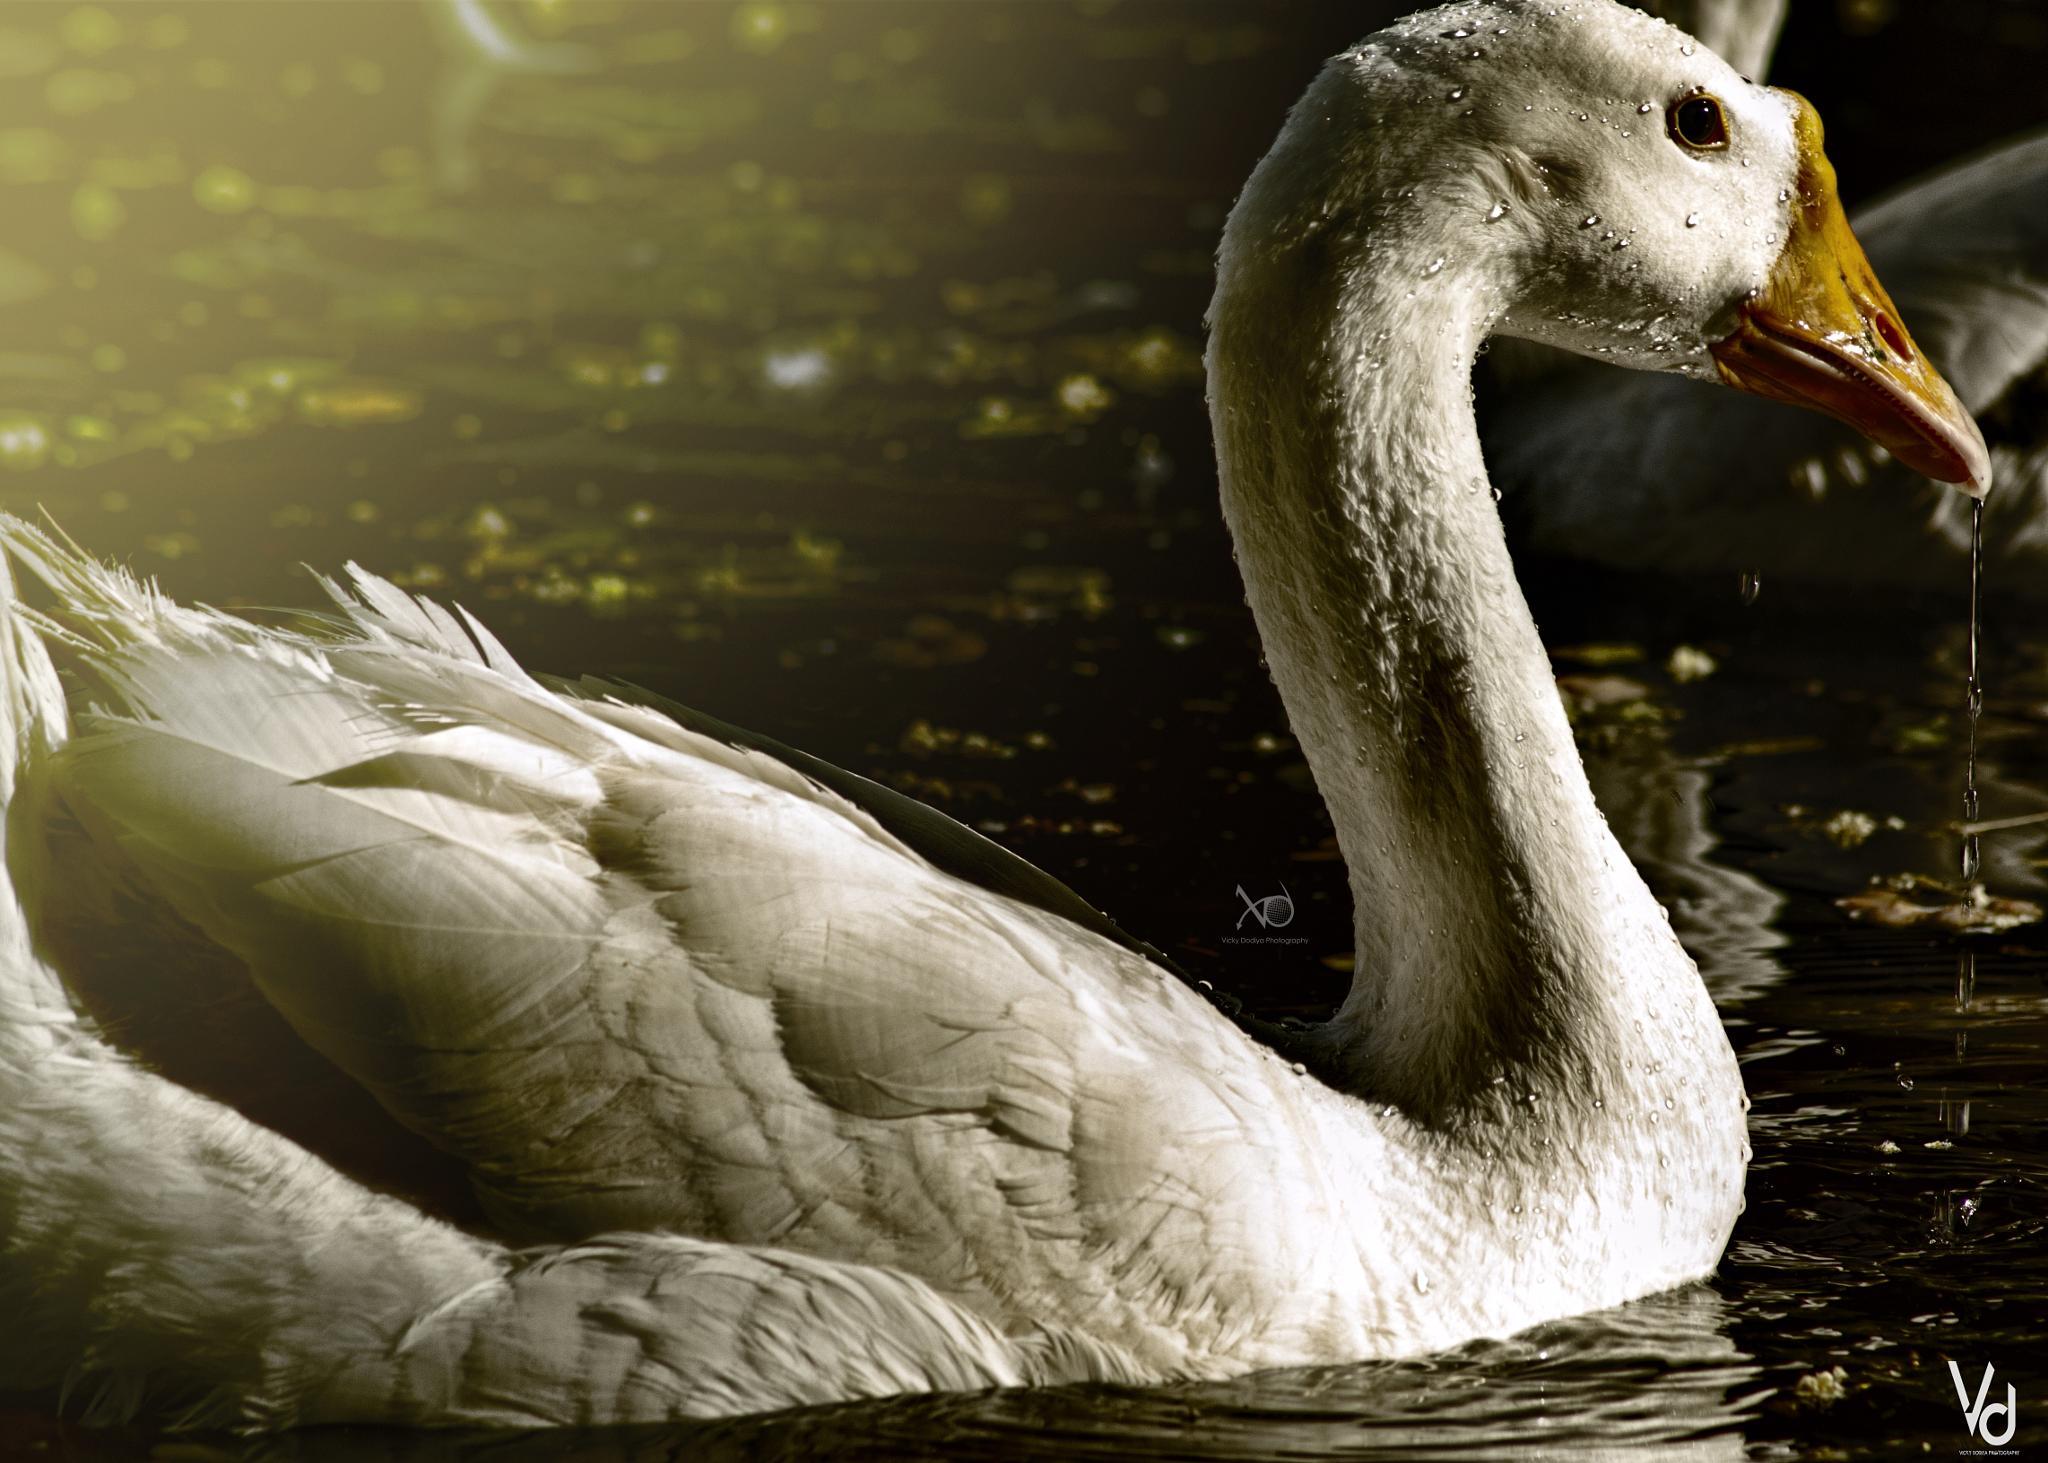 Celestial swan by Vicky Dodiya